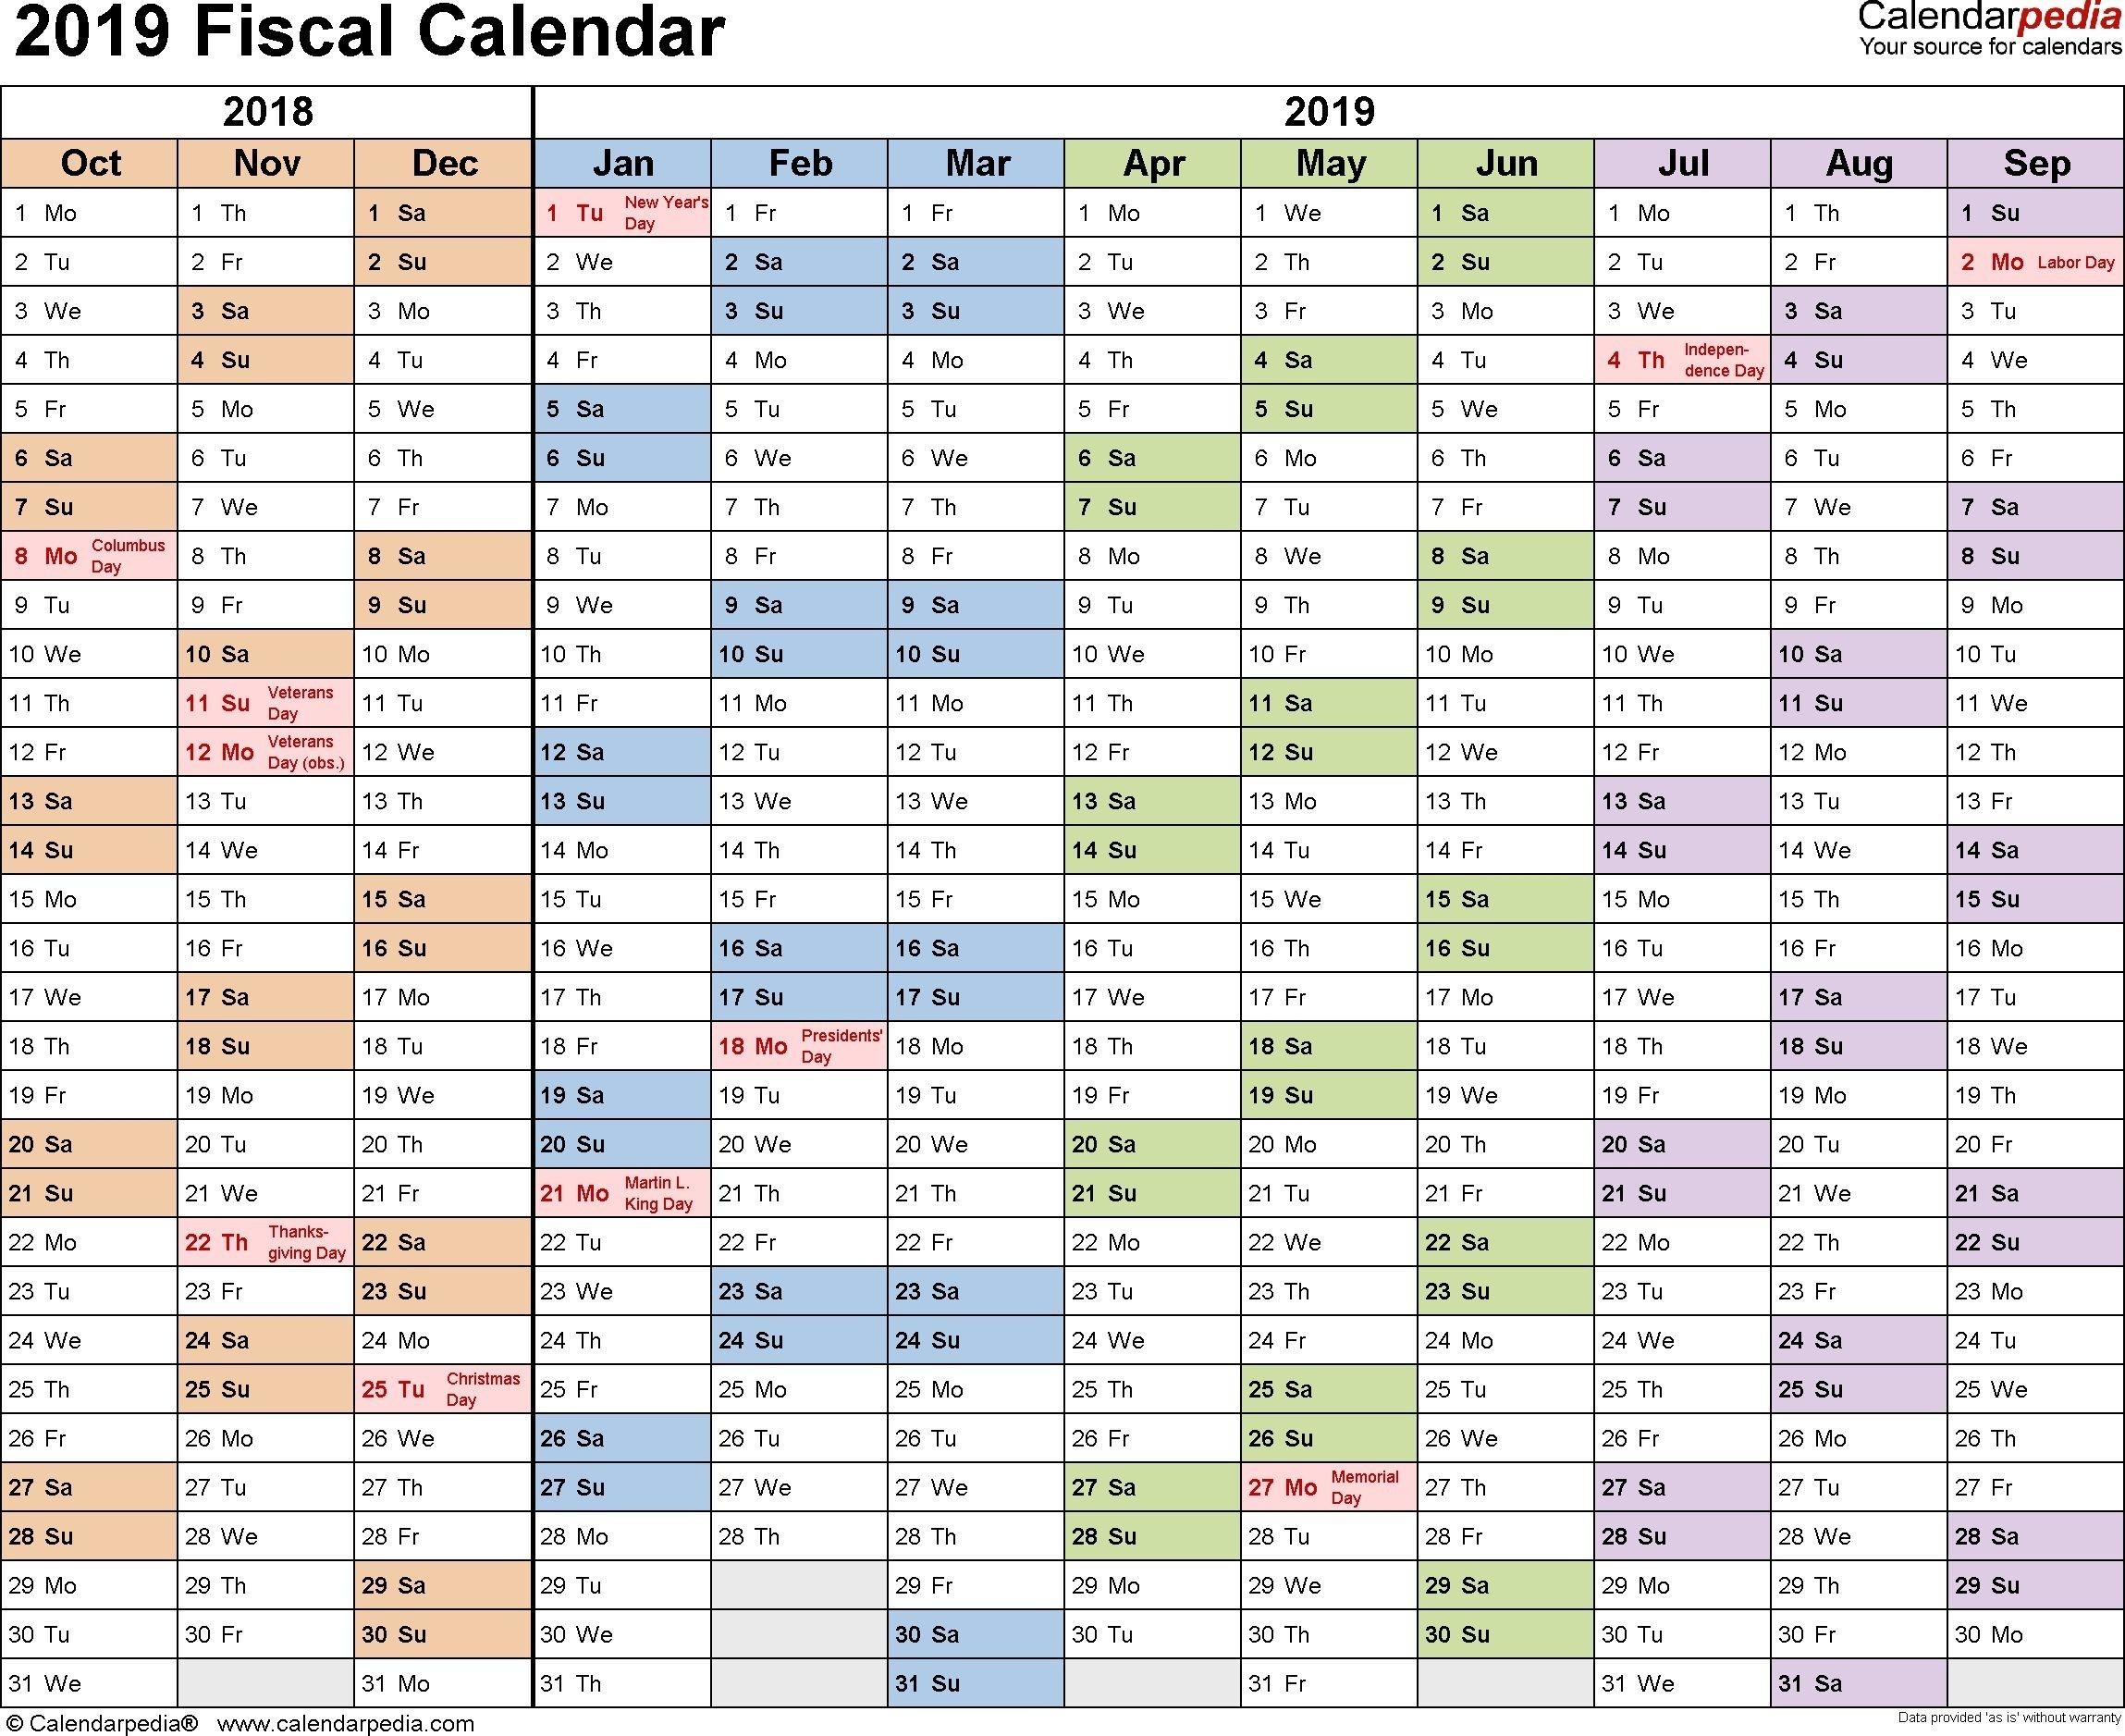 Depo Provera Injection Schedule Calendar 2021  Template throughout Depo Calendar 2021 Printable